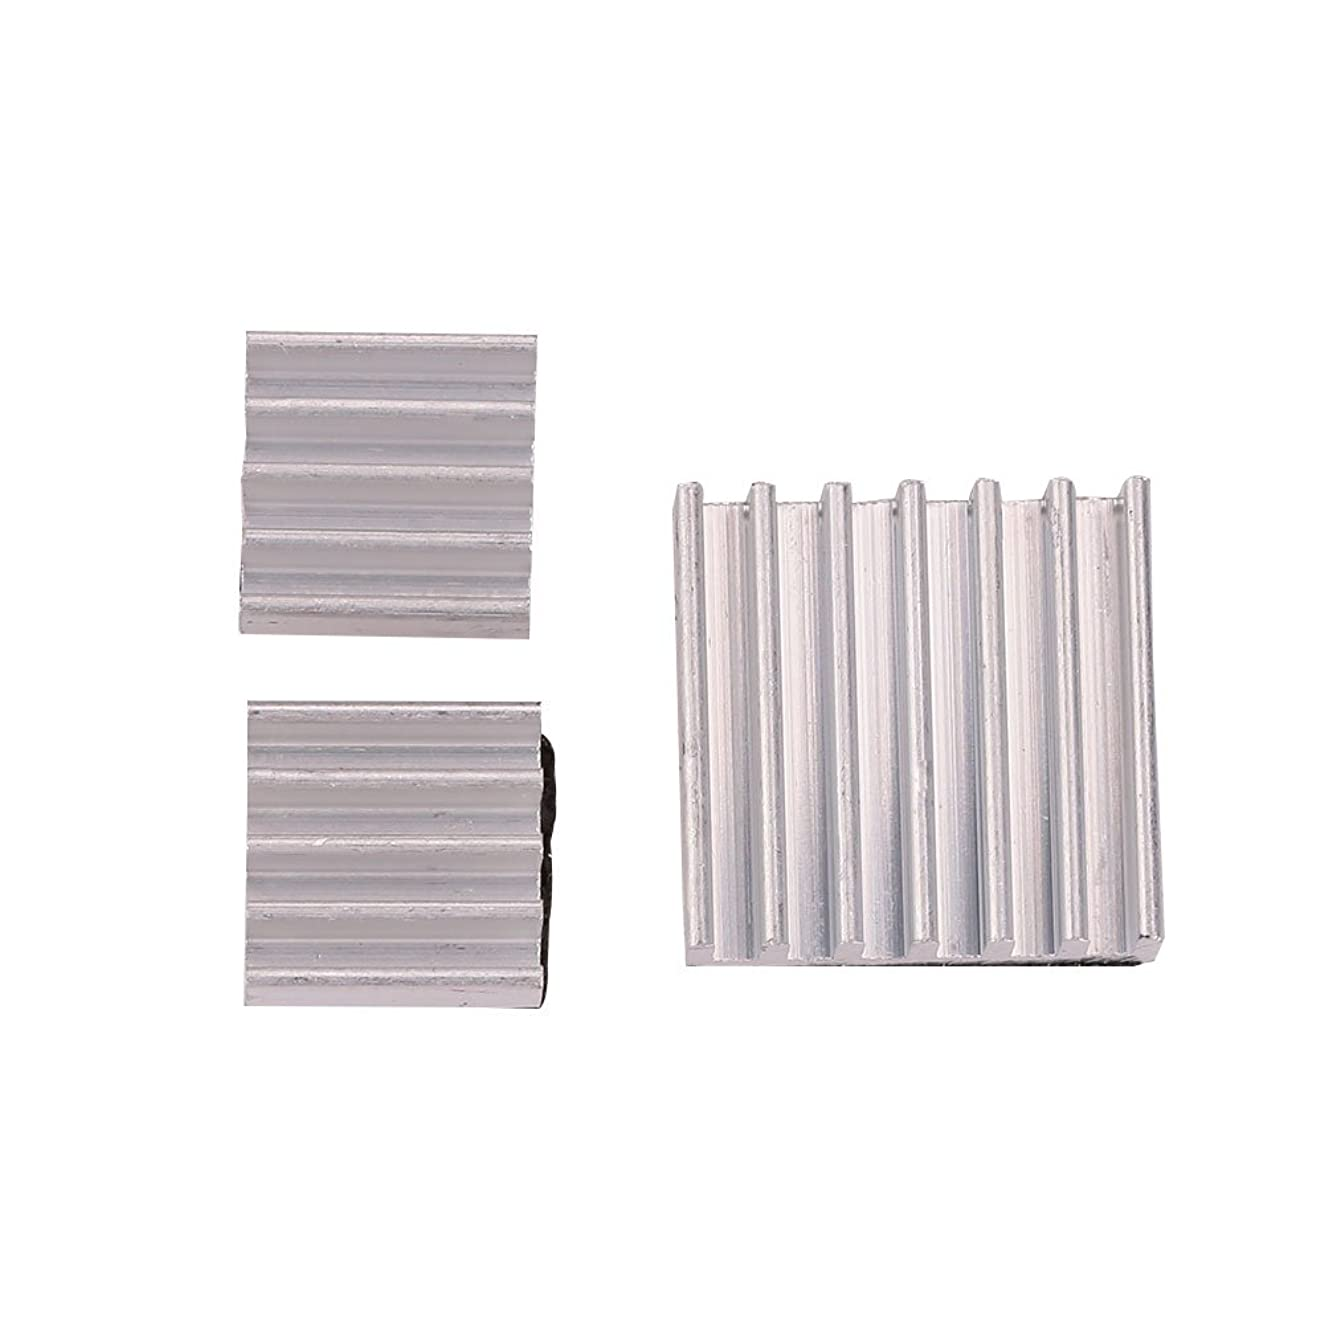 OYJJ Aluminum Heat Sink Ram Heatsink 3 Pcs with Thermal Conductive Adhesive Tape 3Pcs Adhesive Aluminum Heat Sinks Cooling Fin for Raspberry